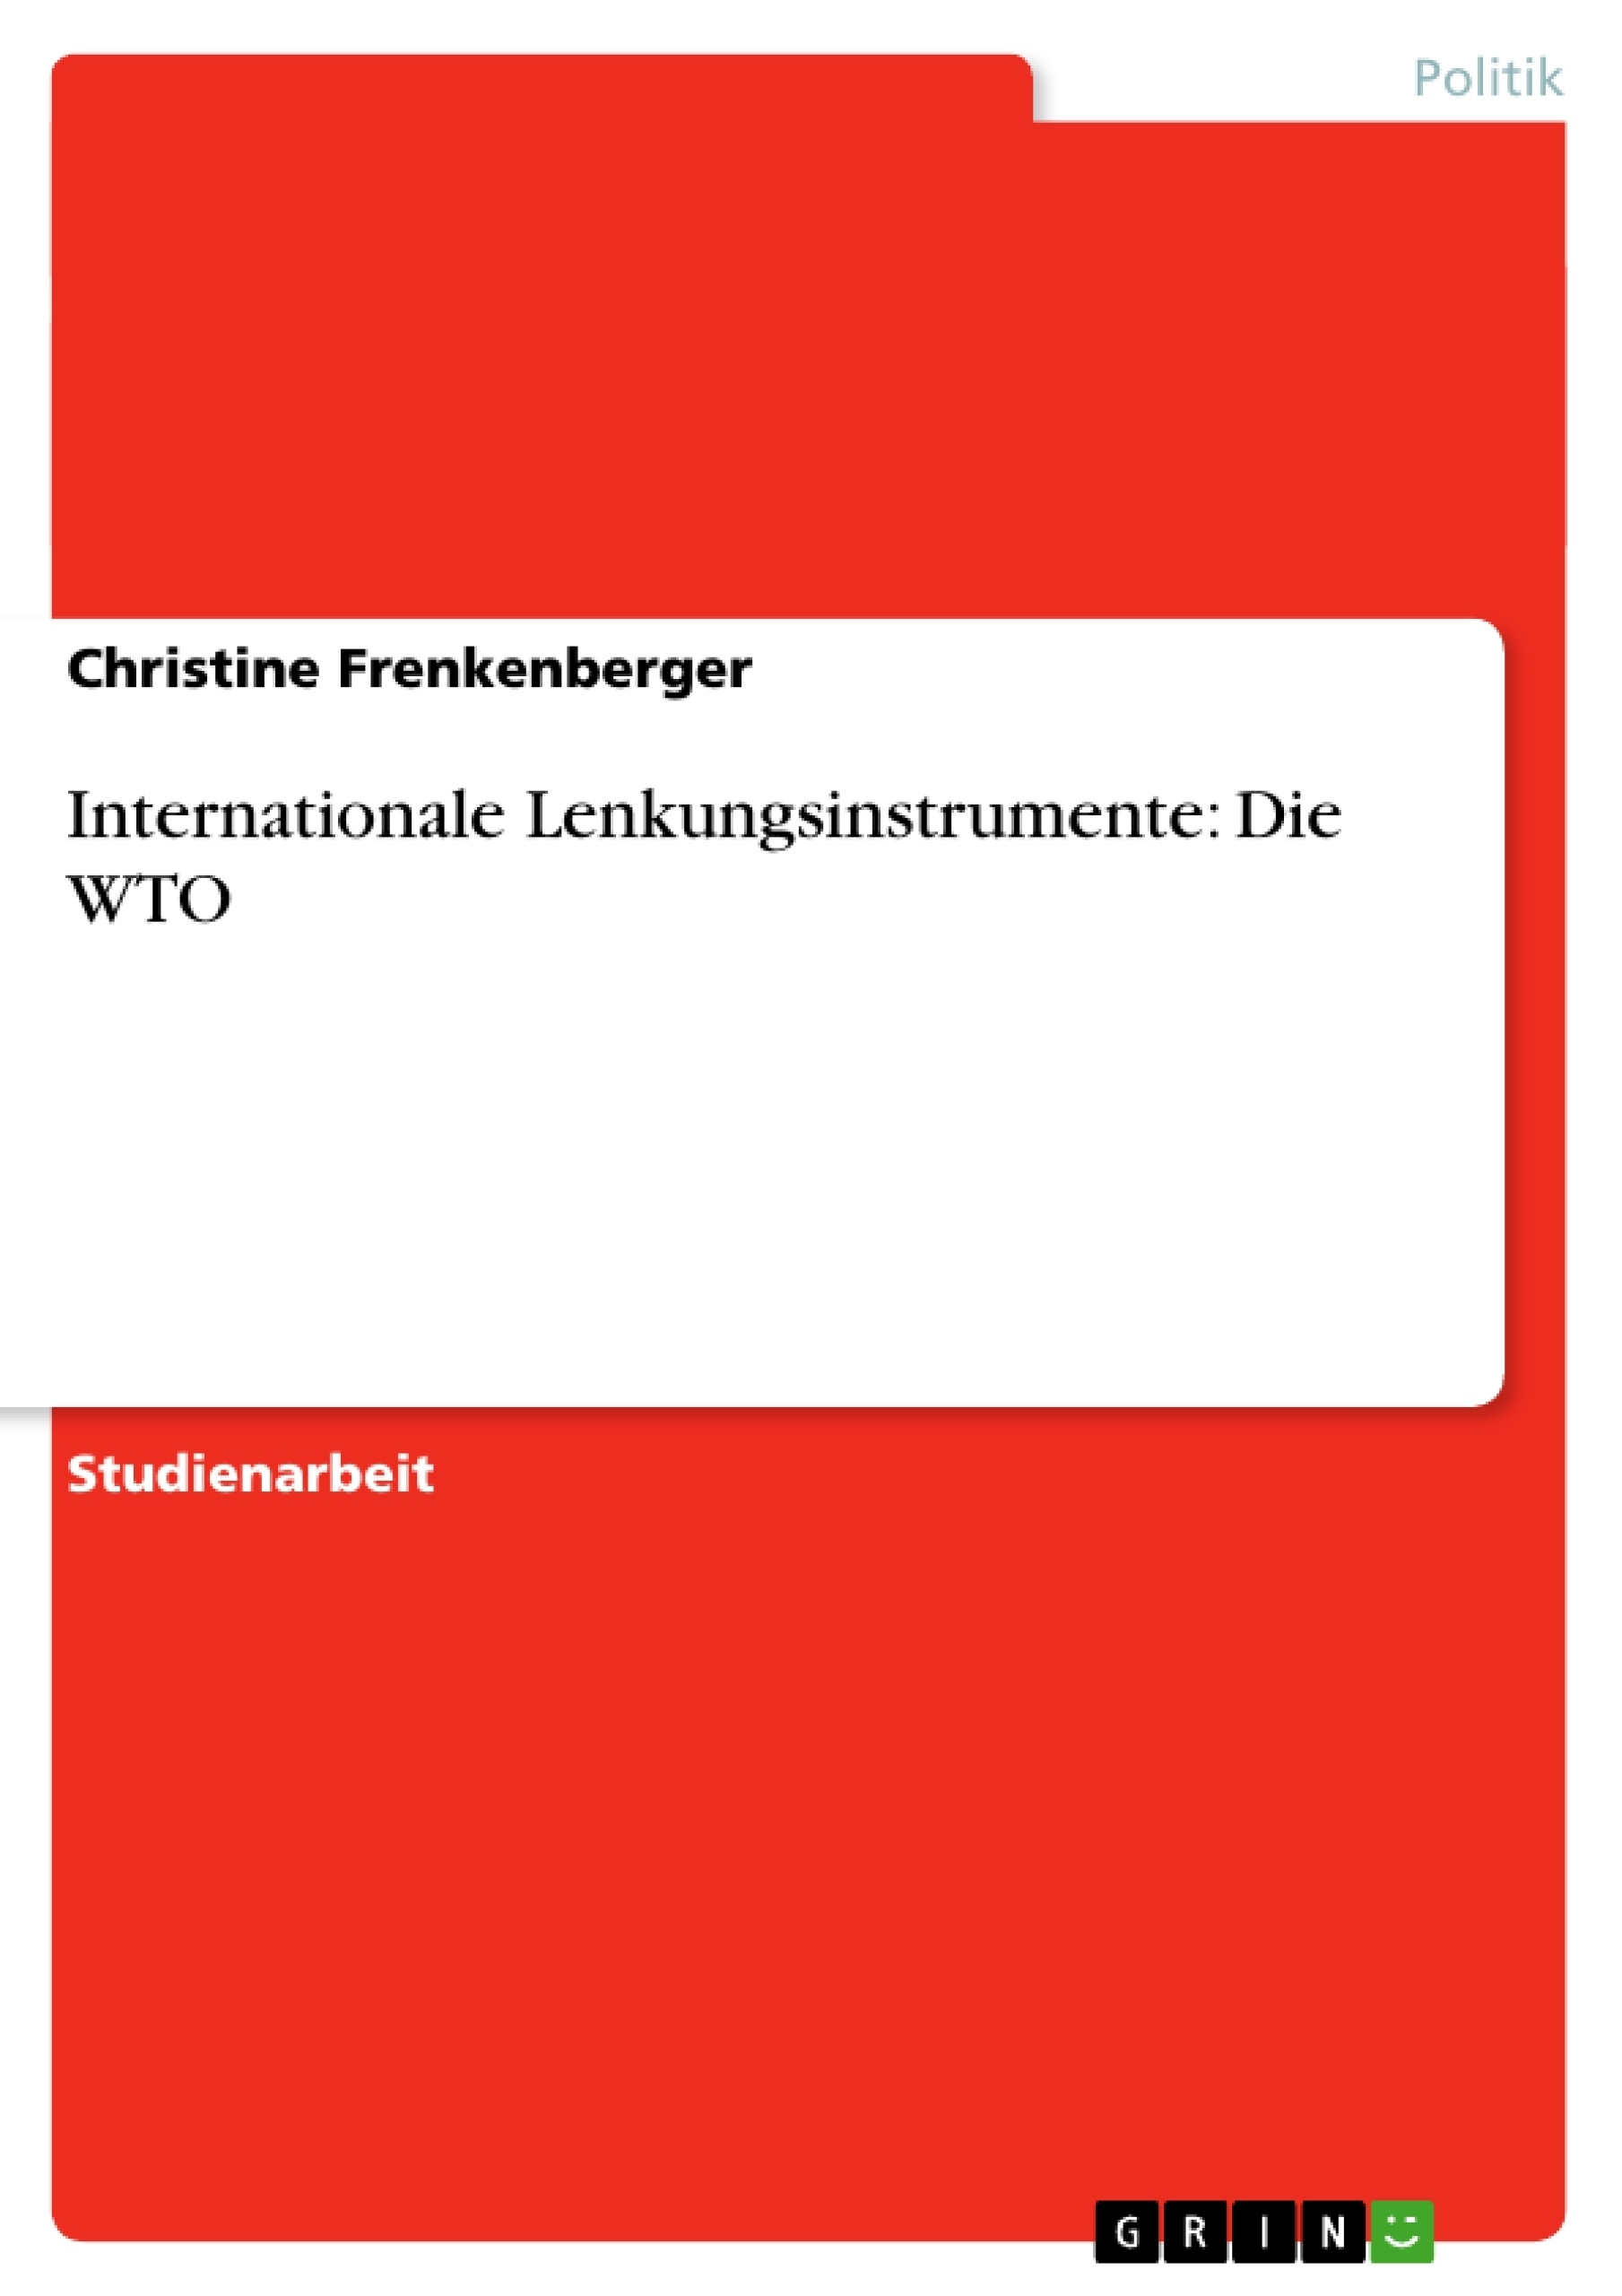 Titel: Internationale Lenkungsinstrumente: Die WTO